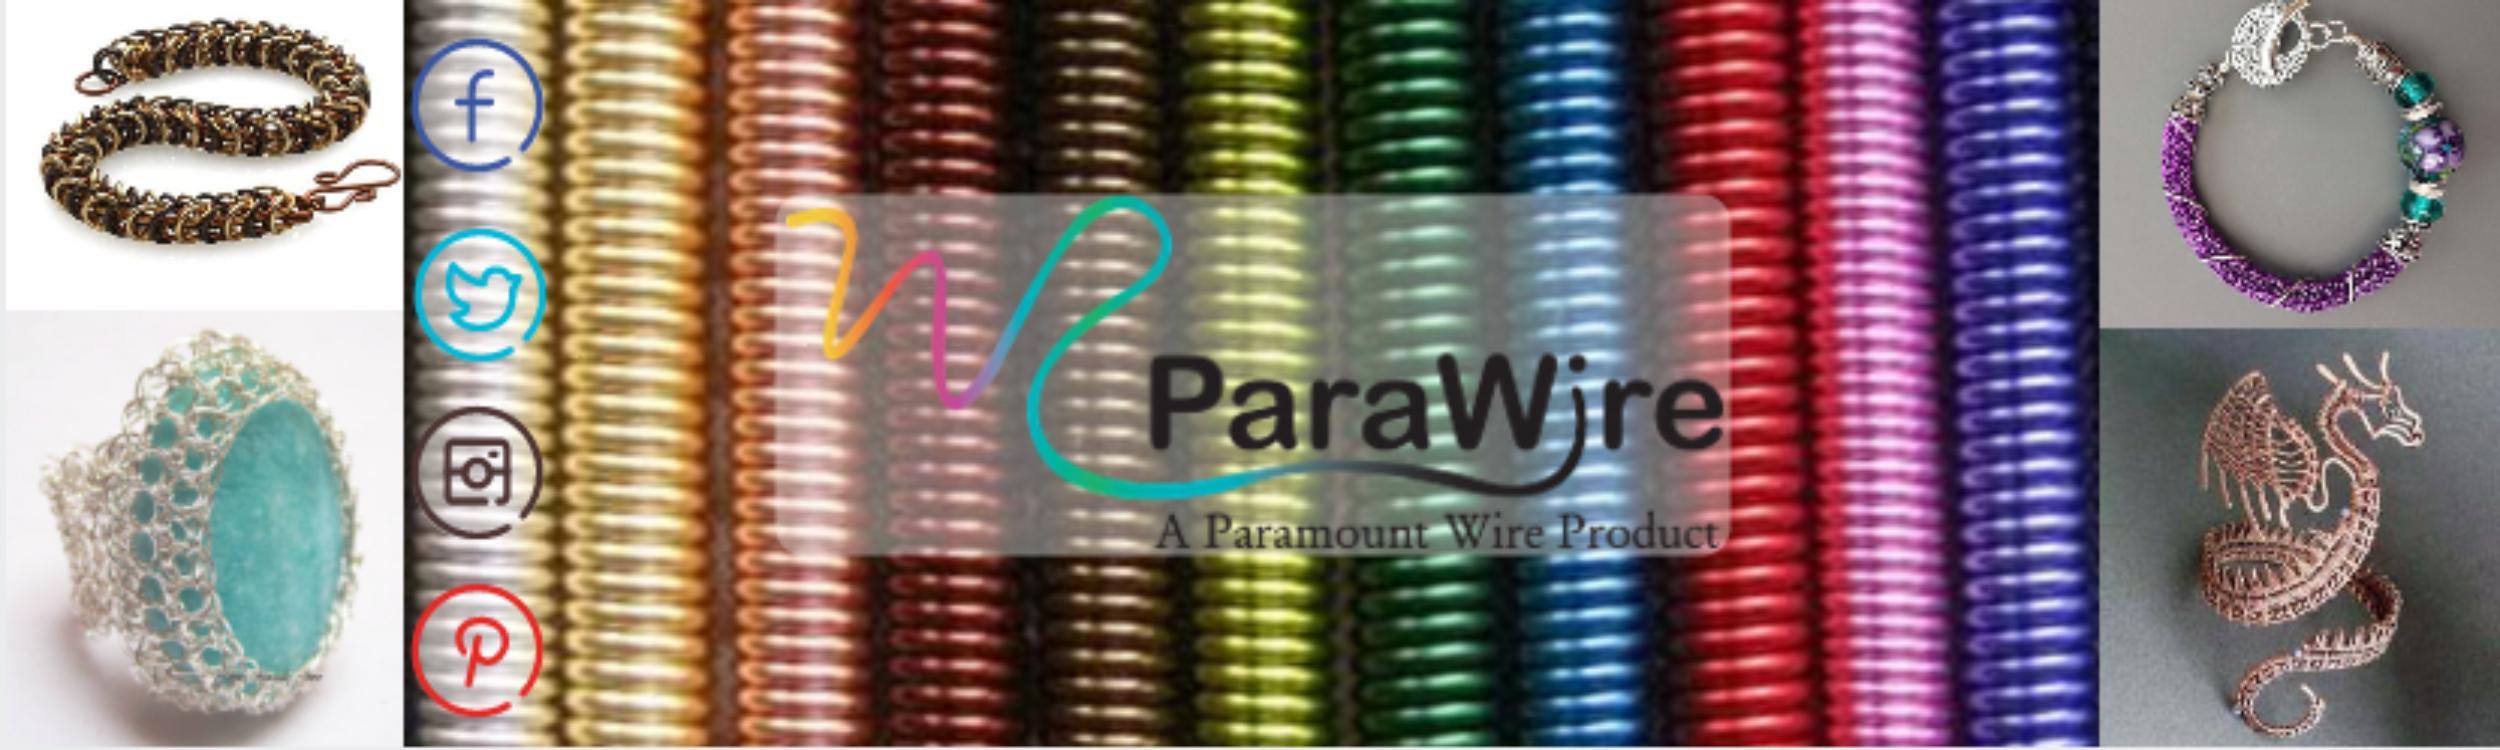 pw web banner